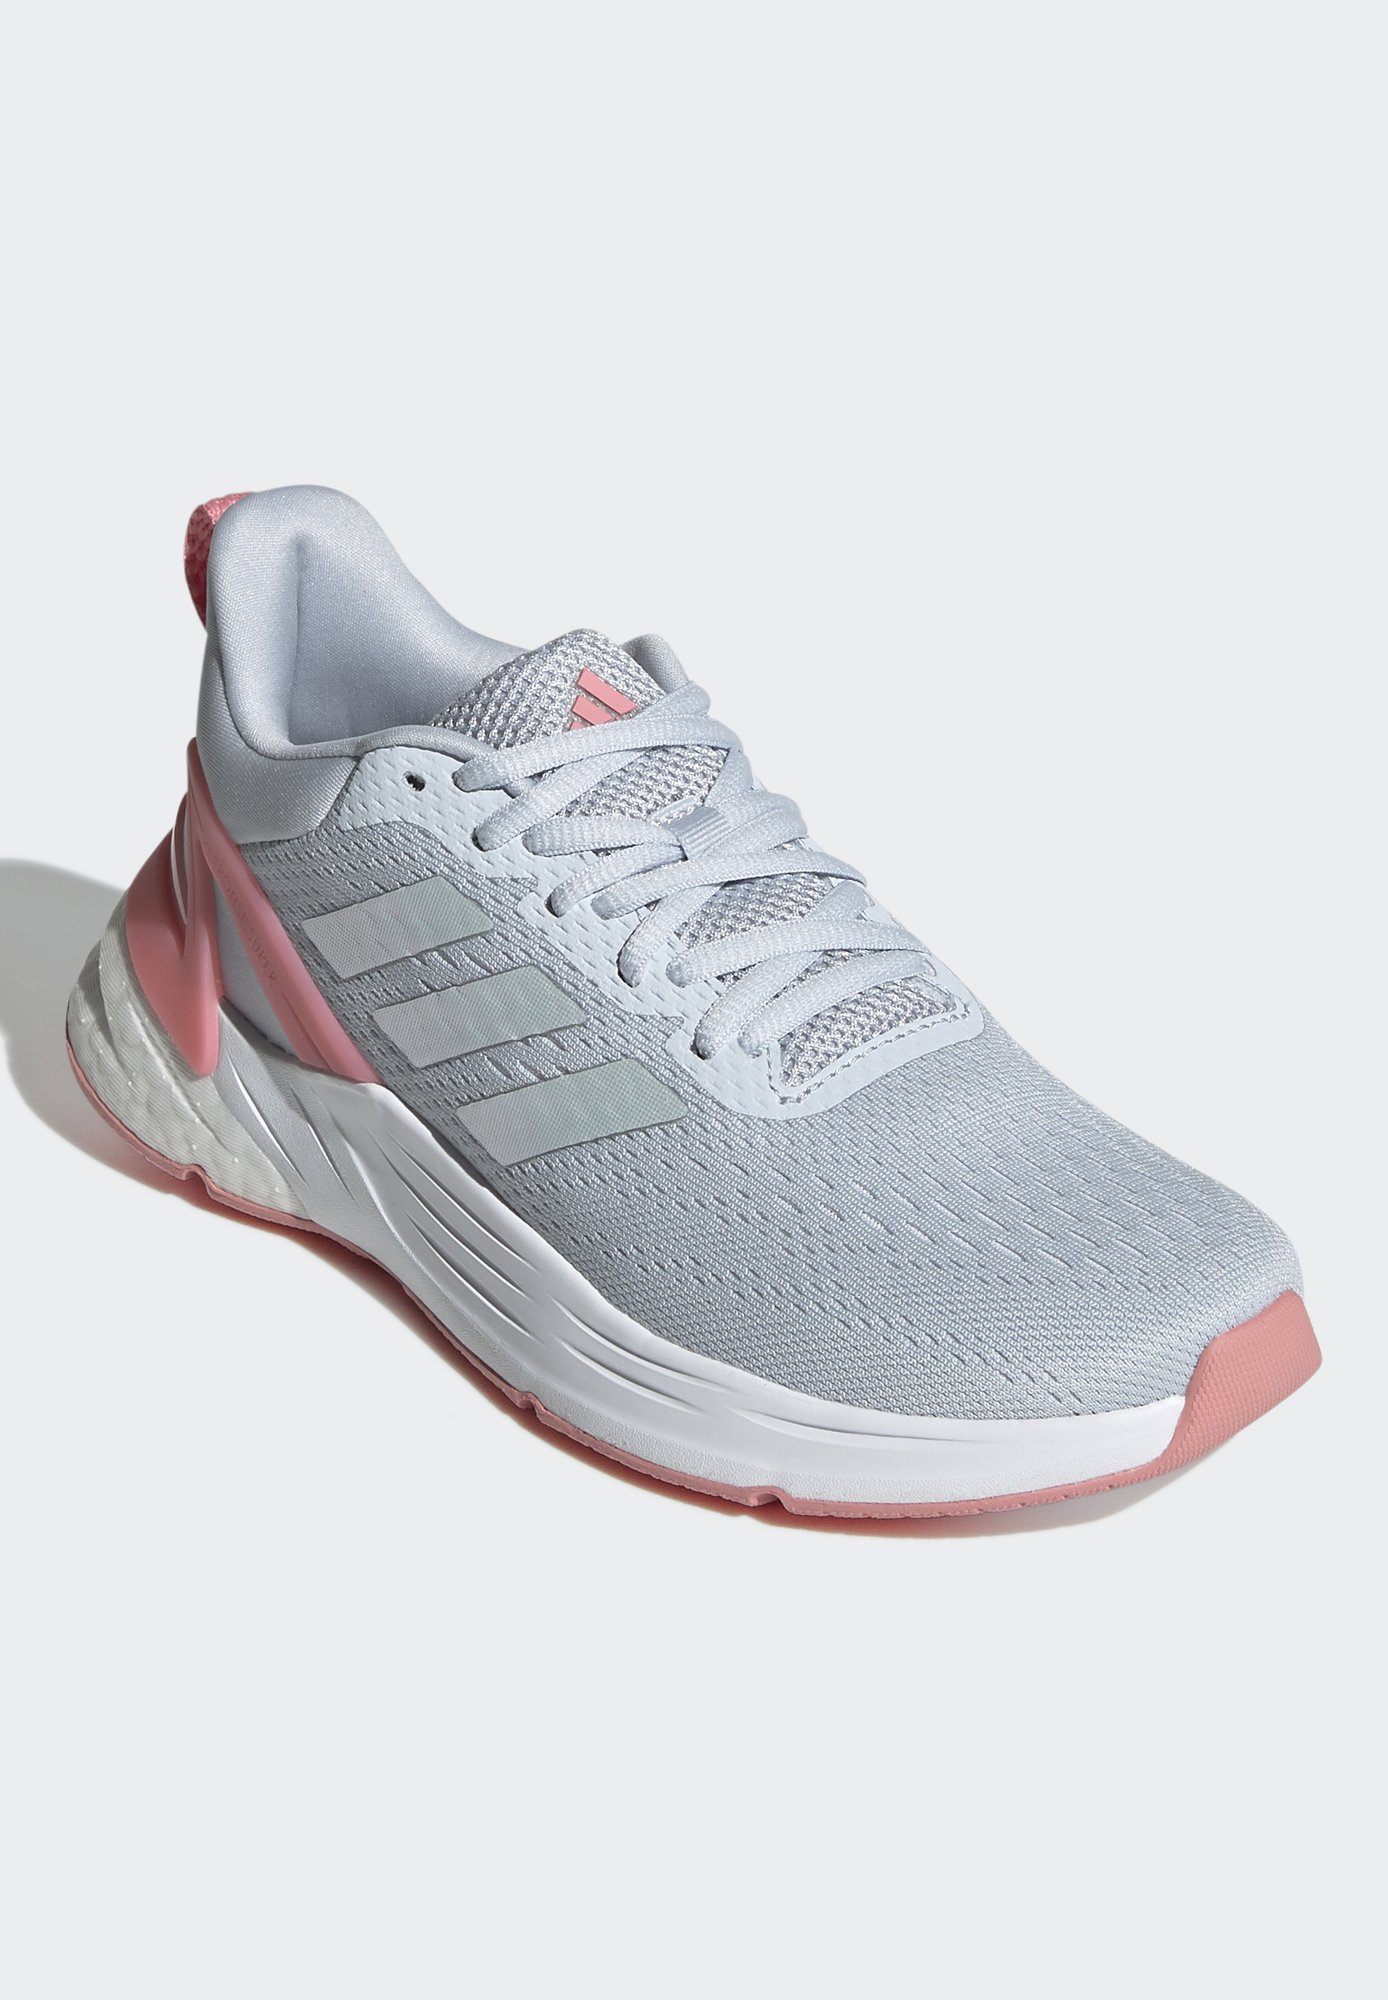 Enfant RESPONSE SUPER 2.0 RUNNING BOOST PRIMEGREEN SHOES UNISEX - Chaussures de running neutres